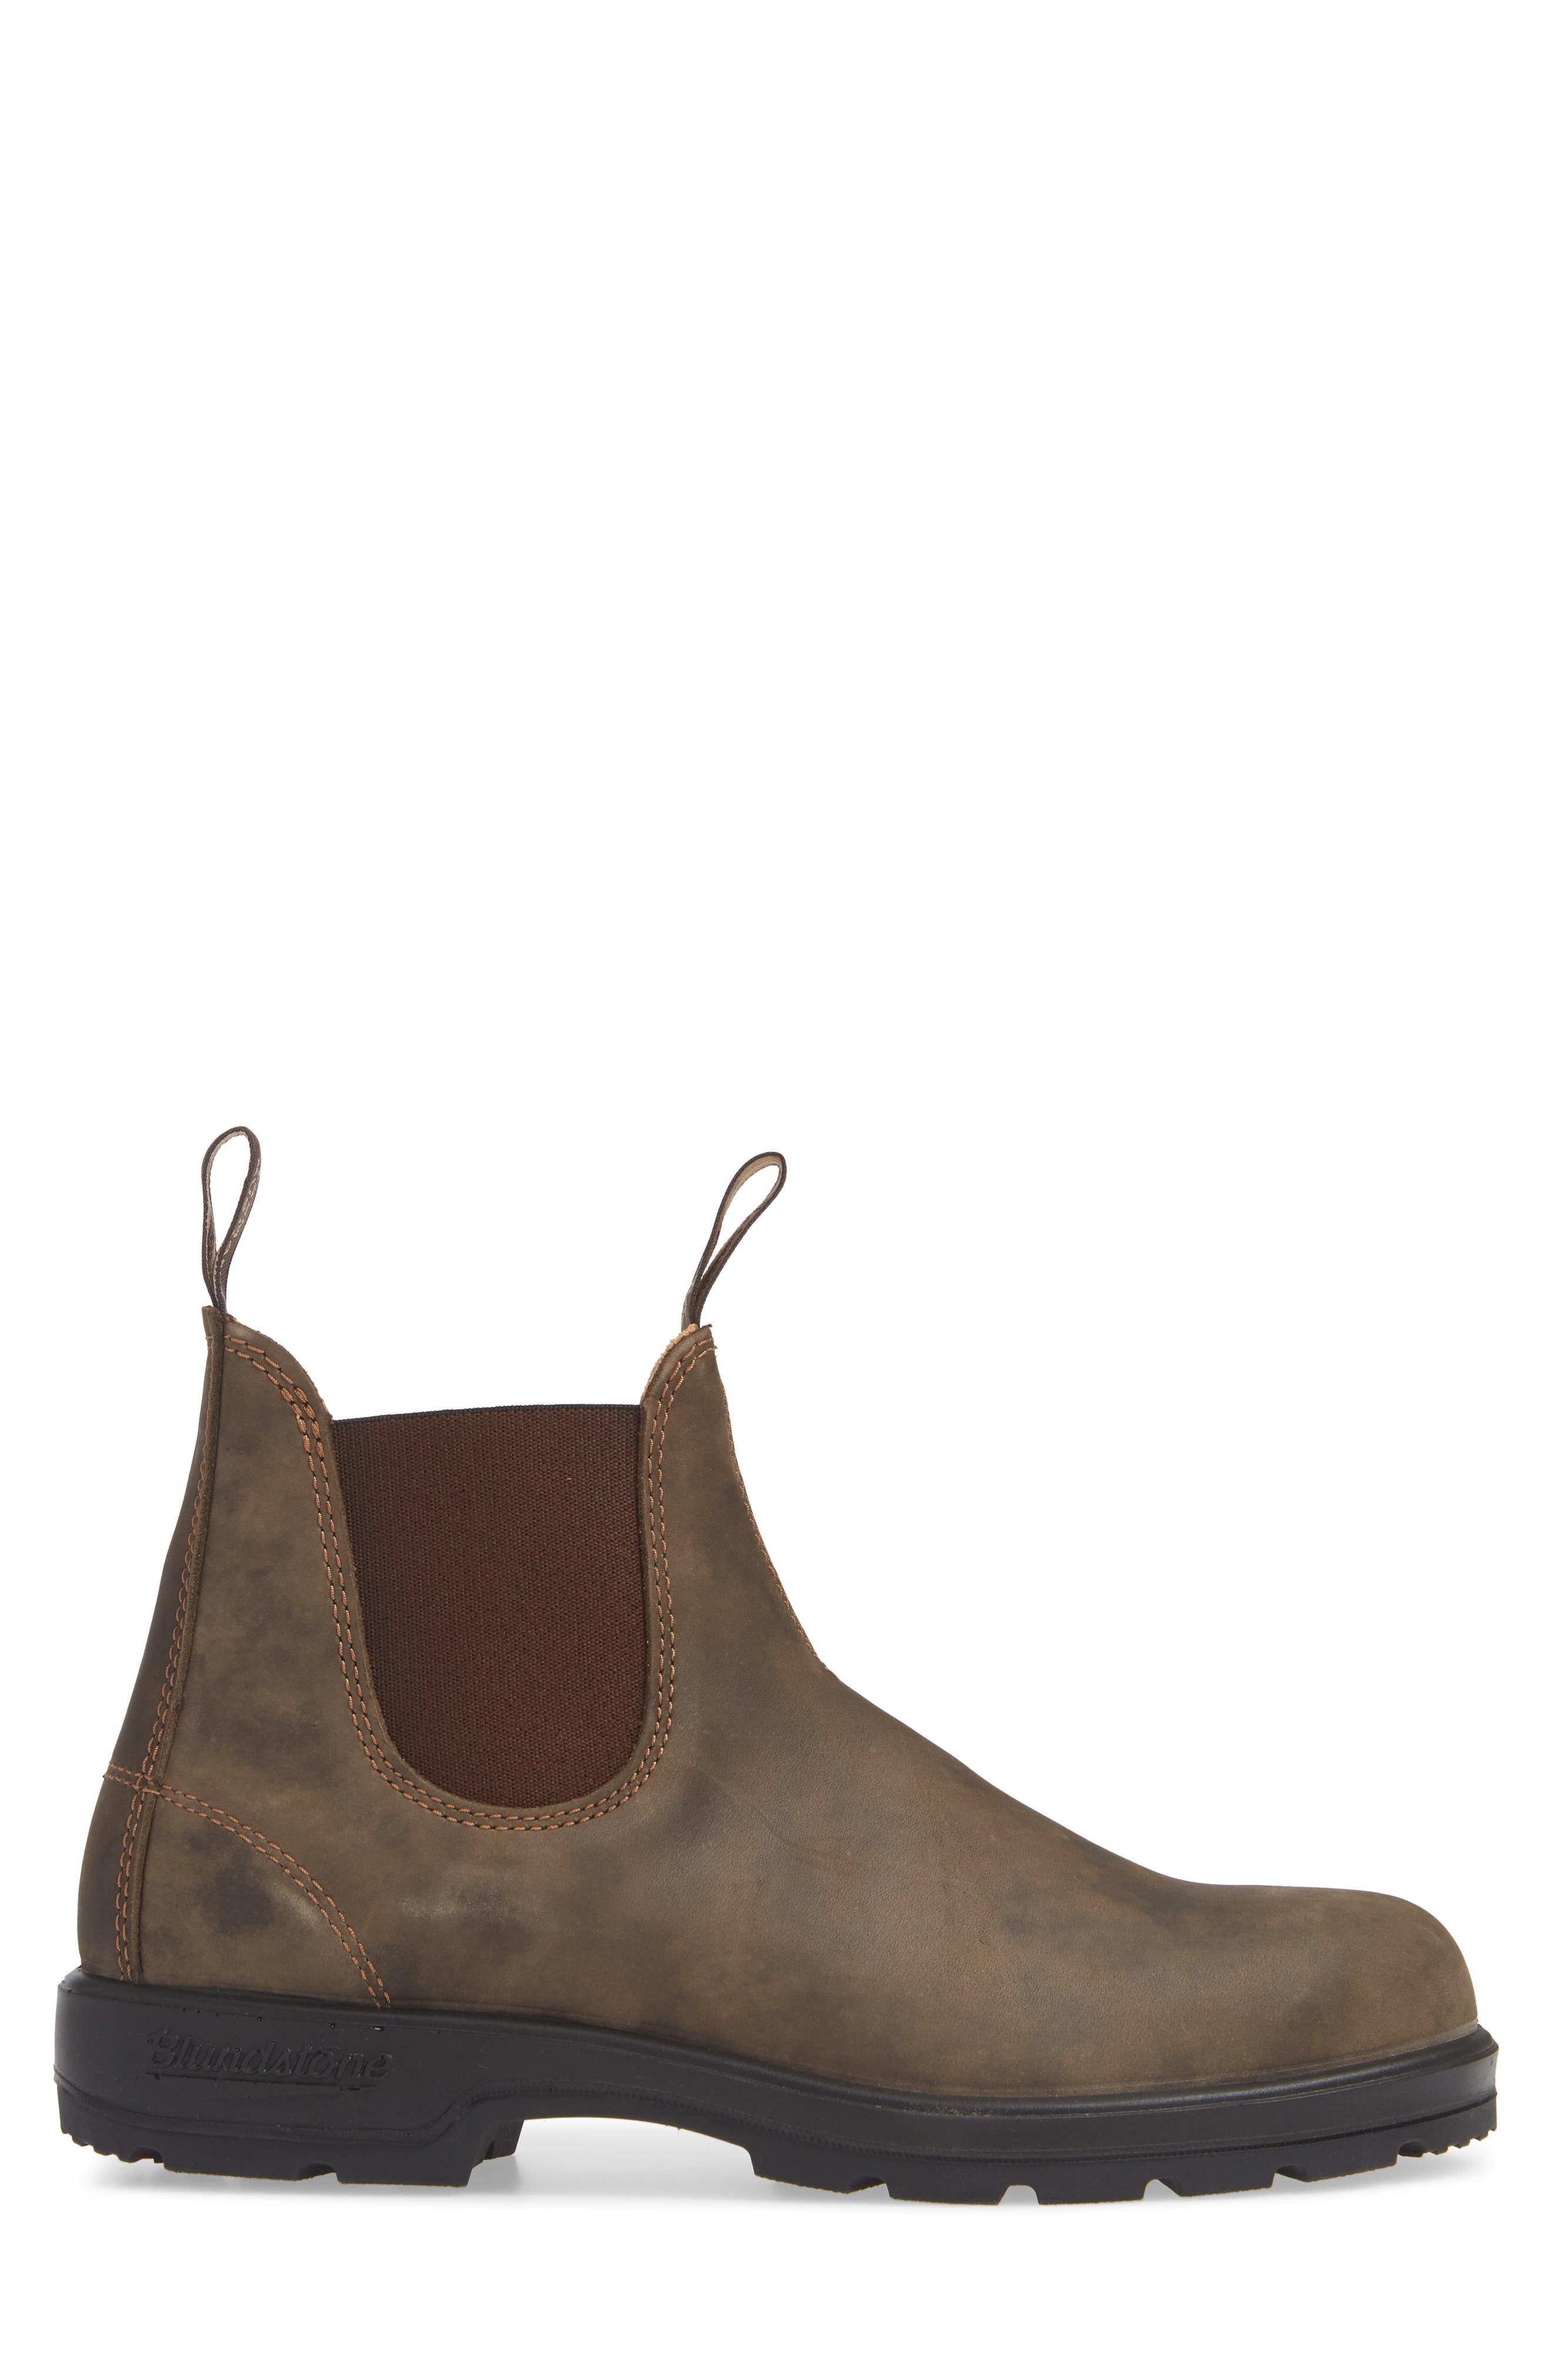 Chelsea Boot,                             Alternate thumbnail 3, color,                             RUSTIC BROWN